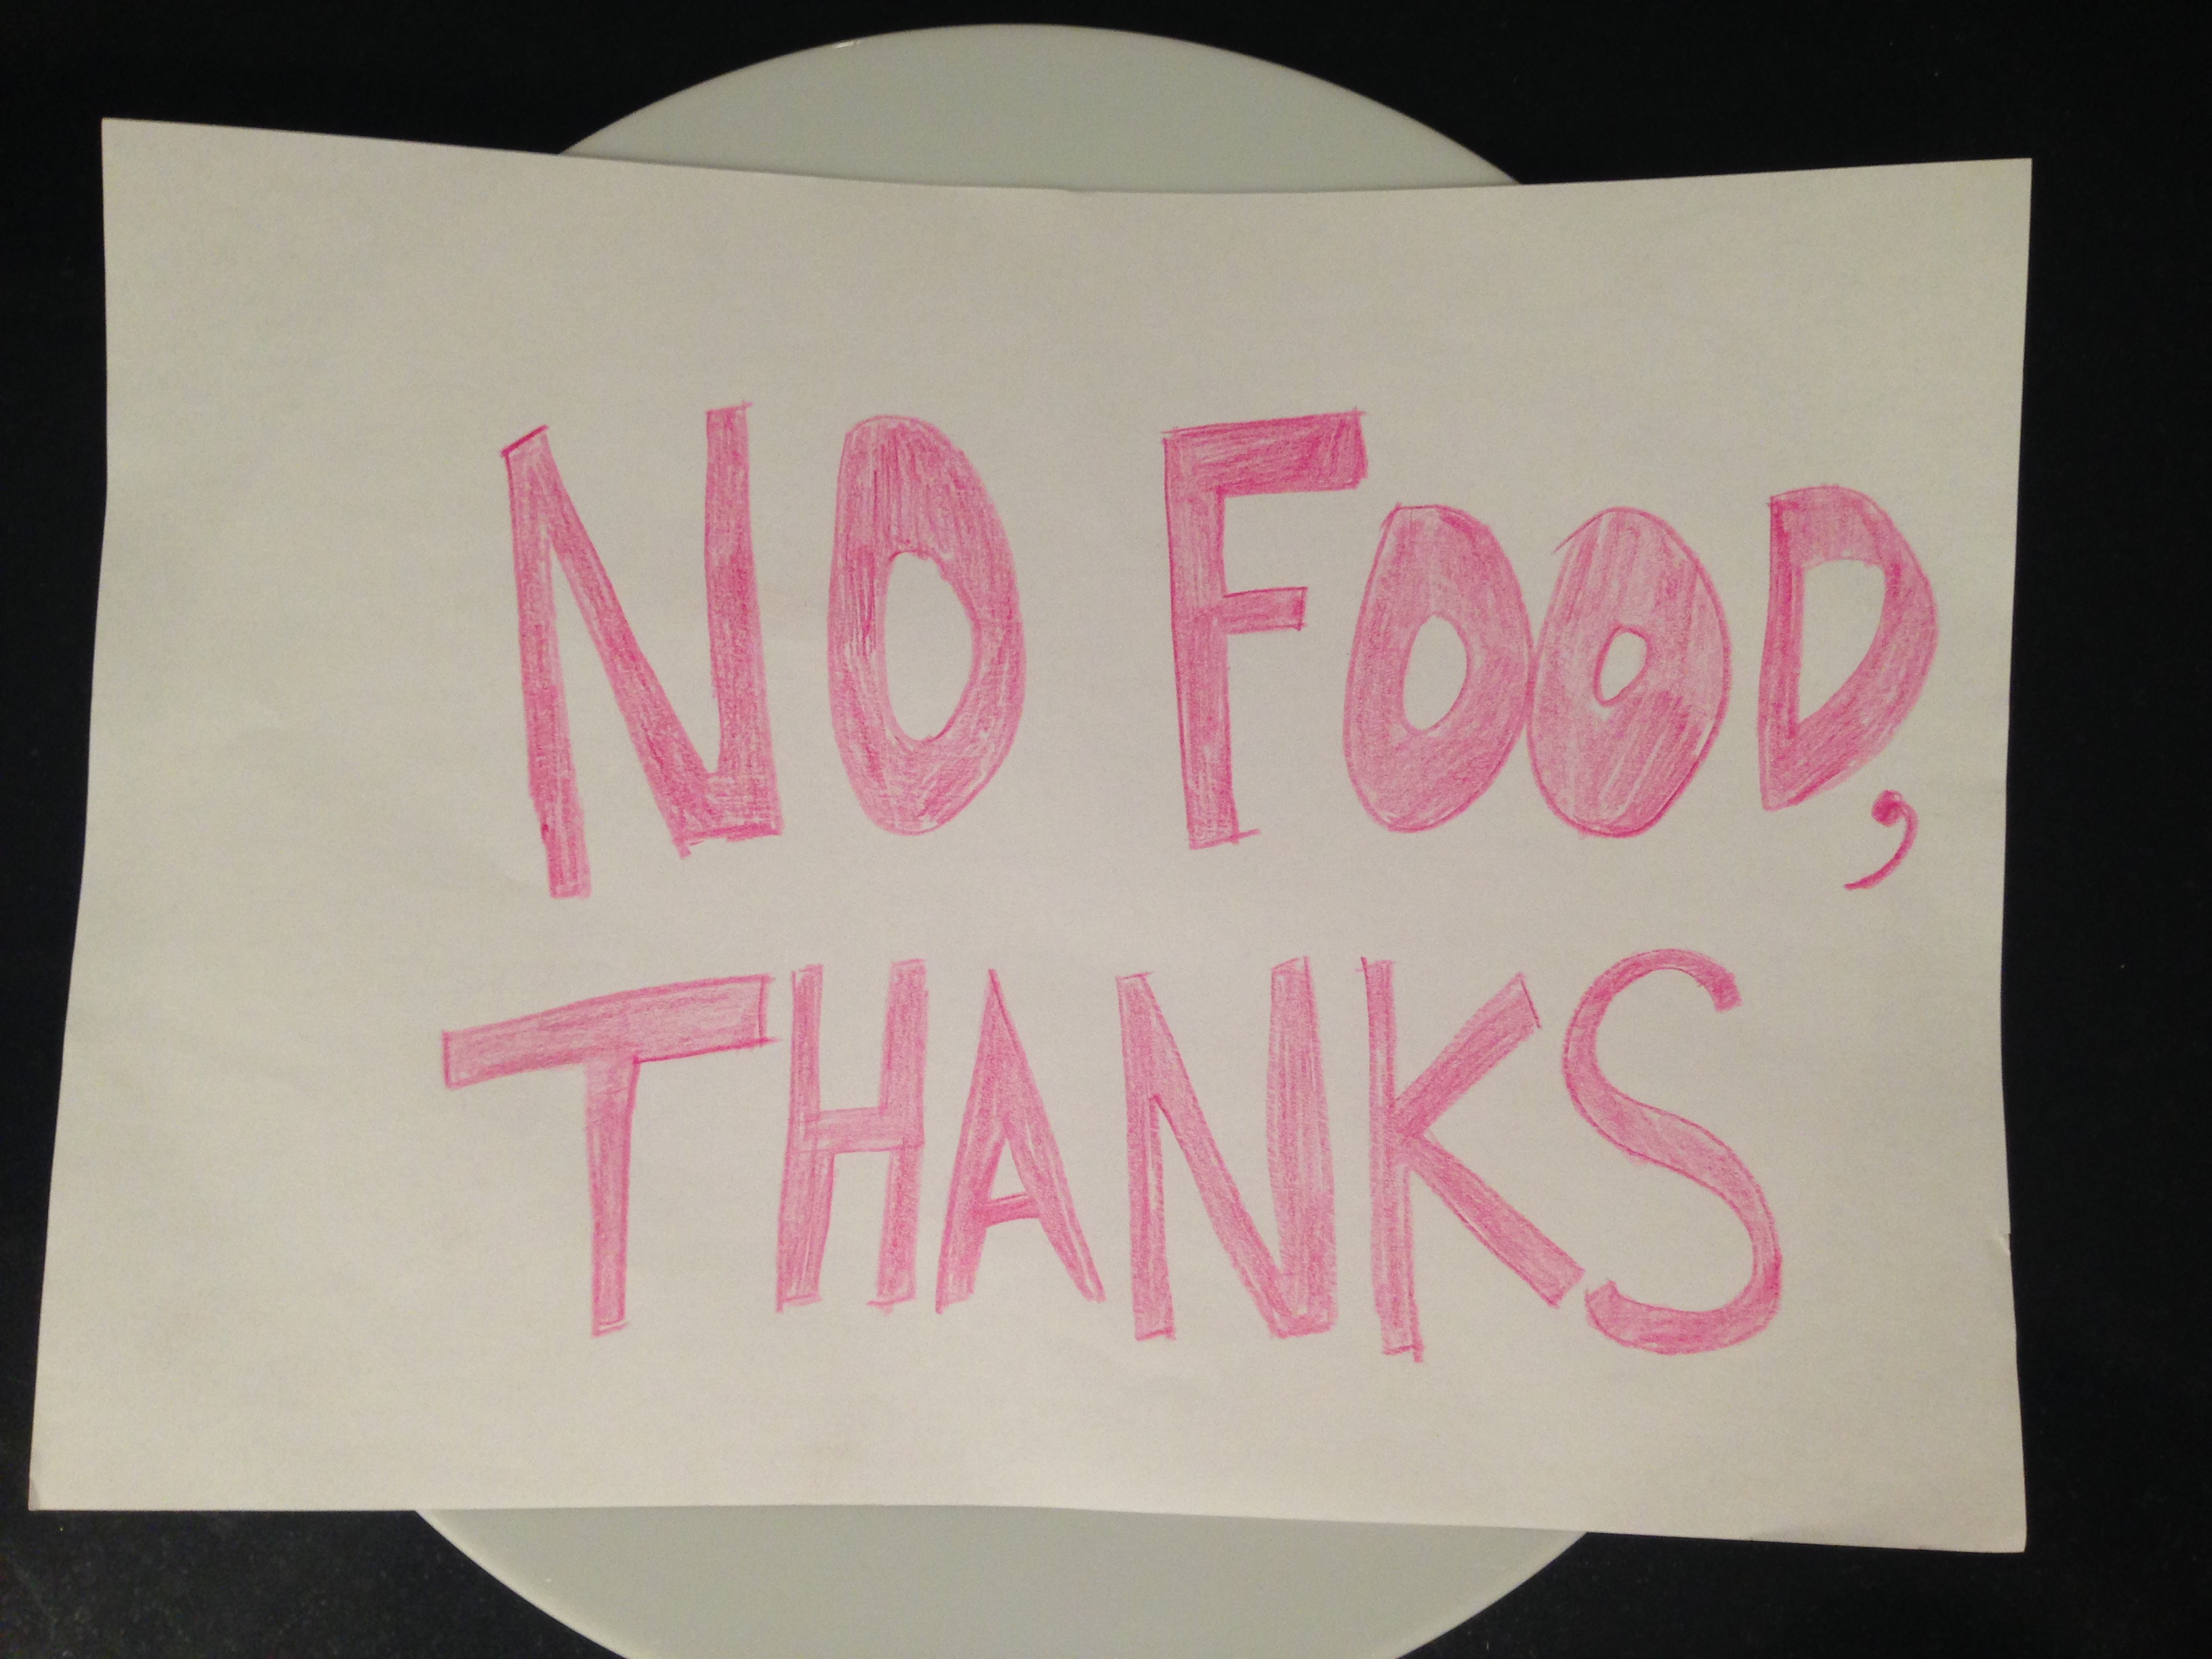 No food thanks